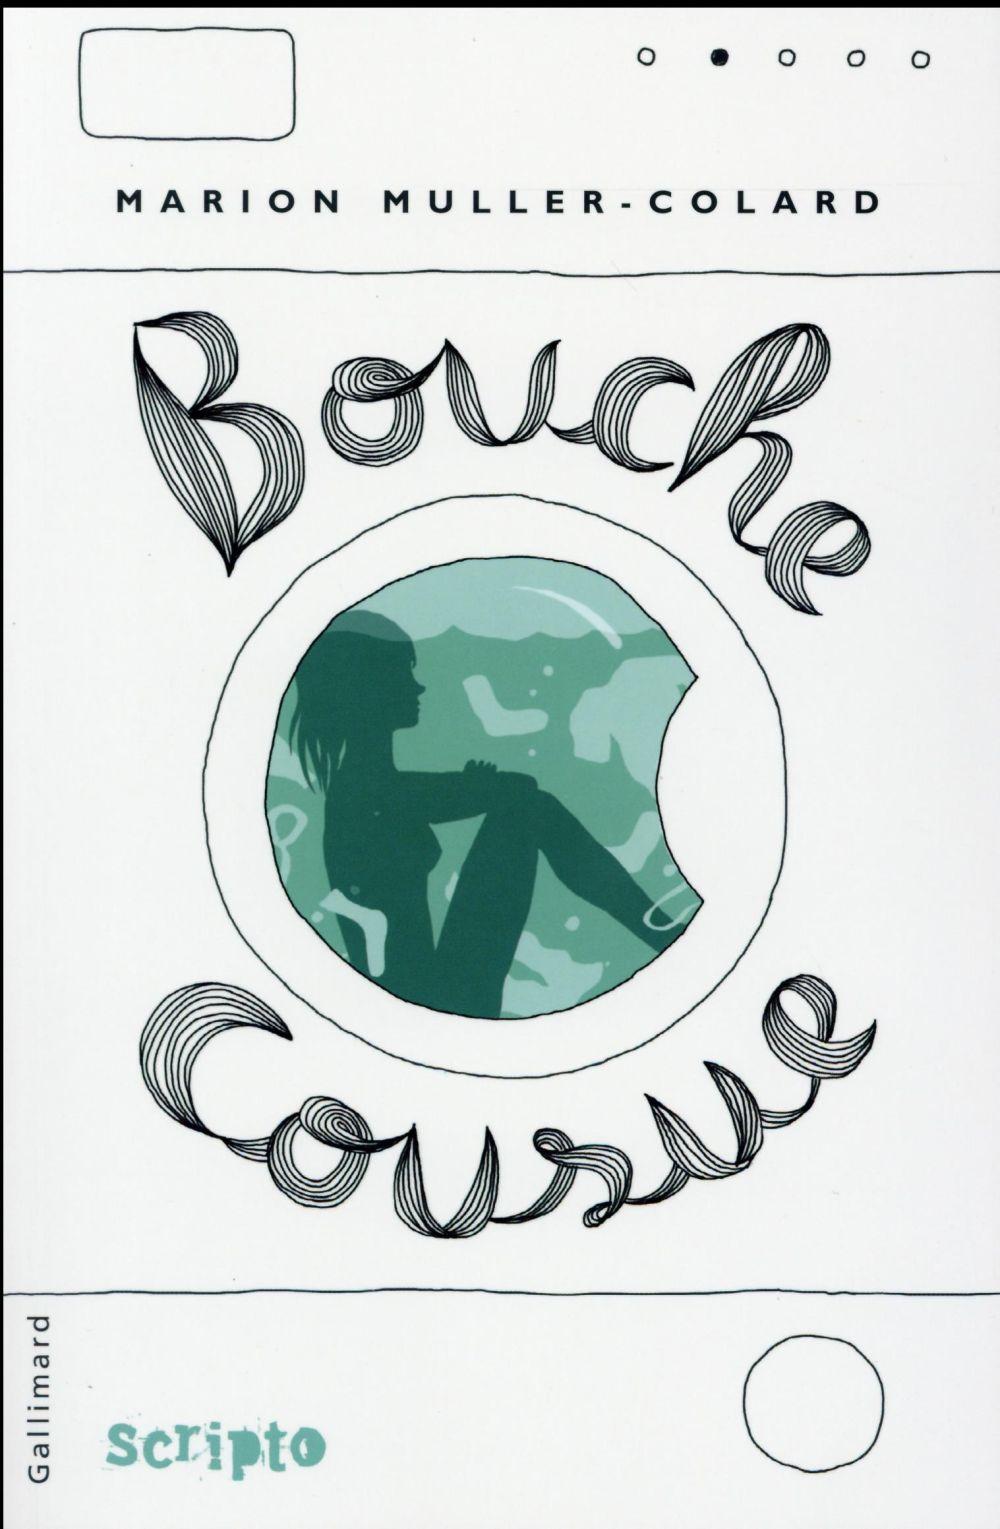 BOUCHE COUSUE MULLER-COLARD MARION GALLIMARD JEUNE